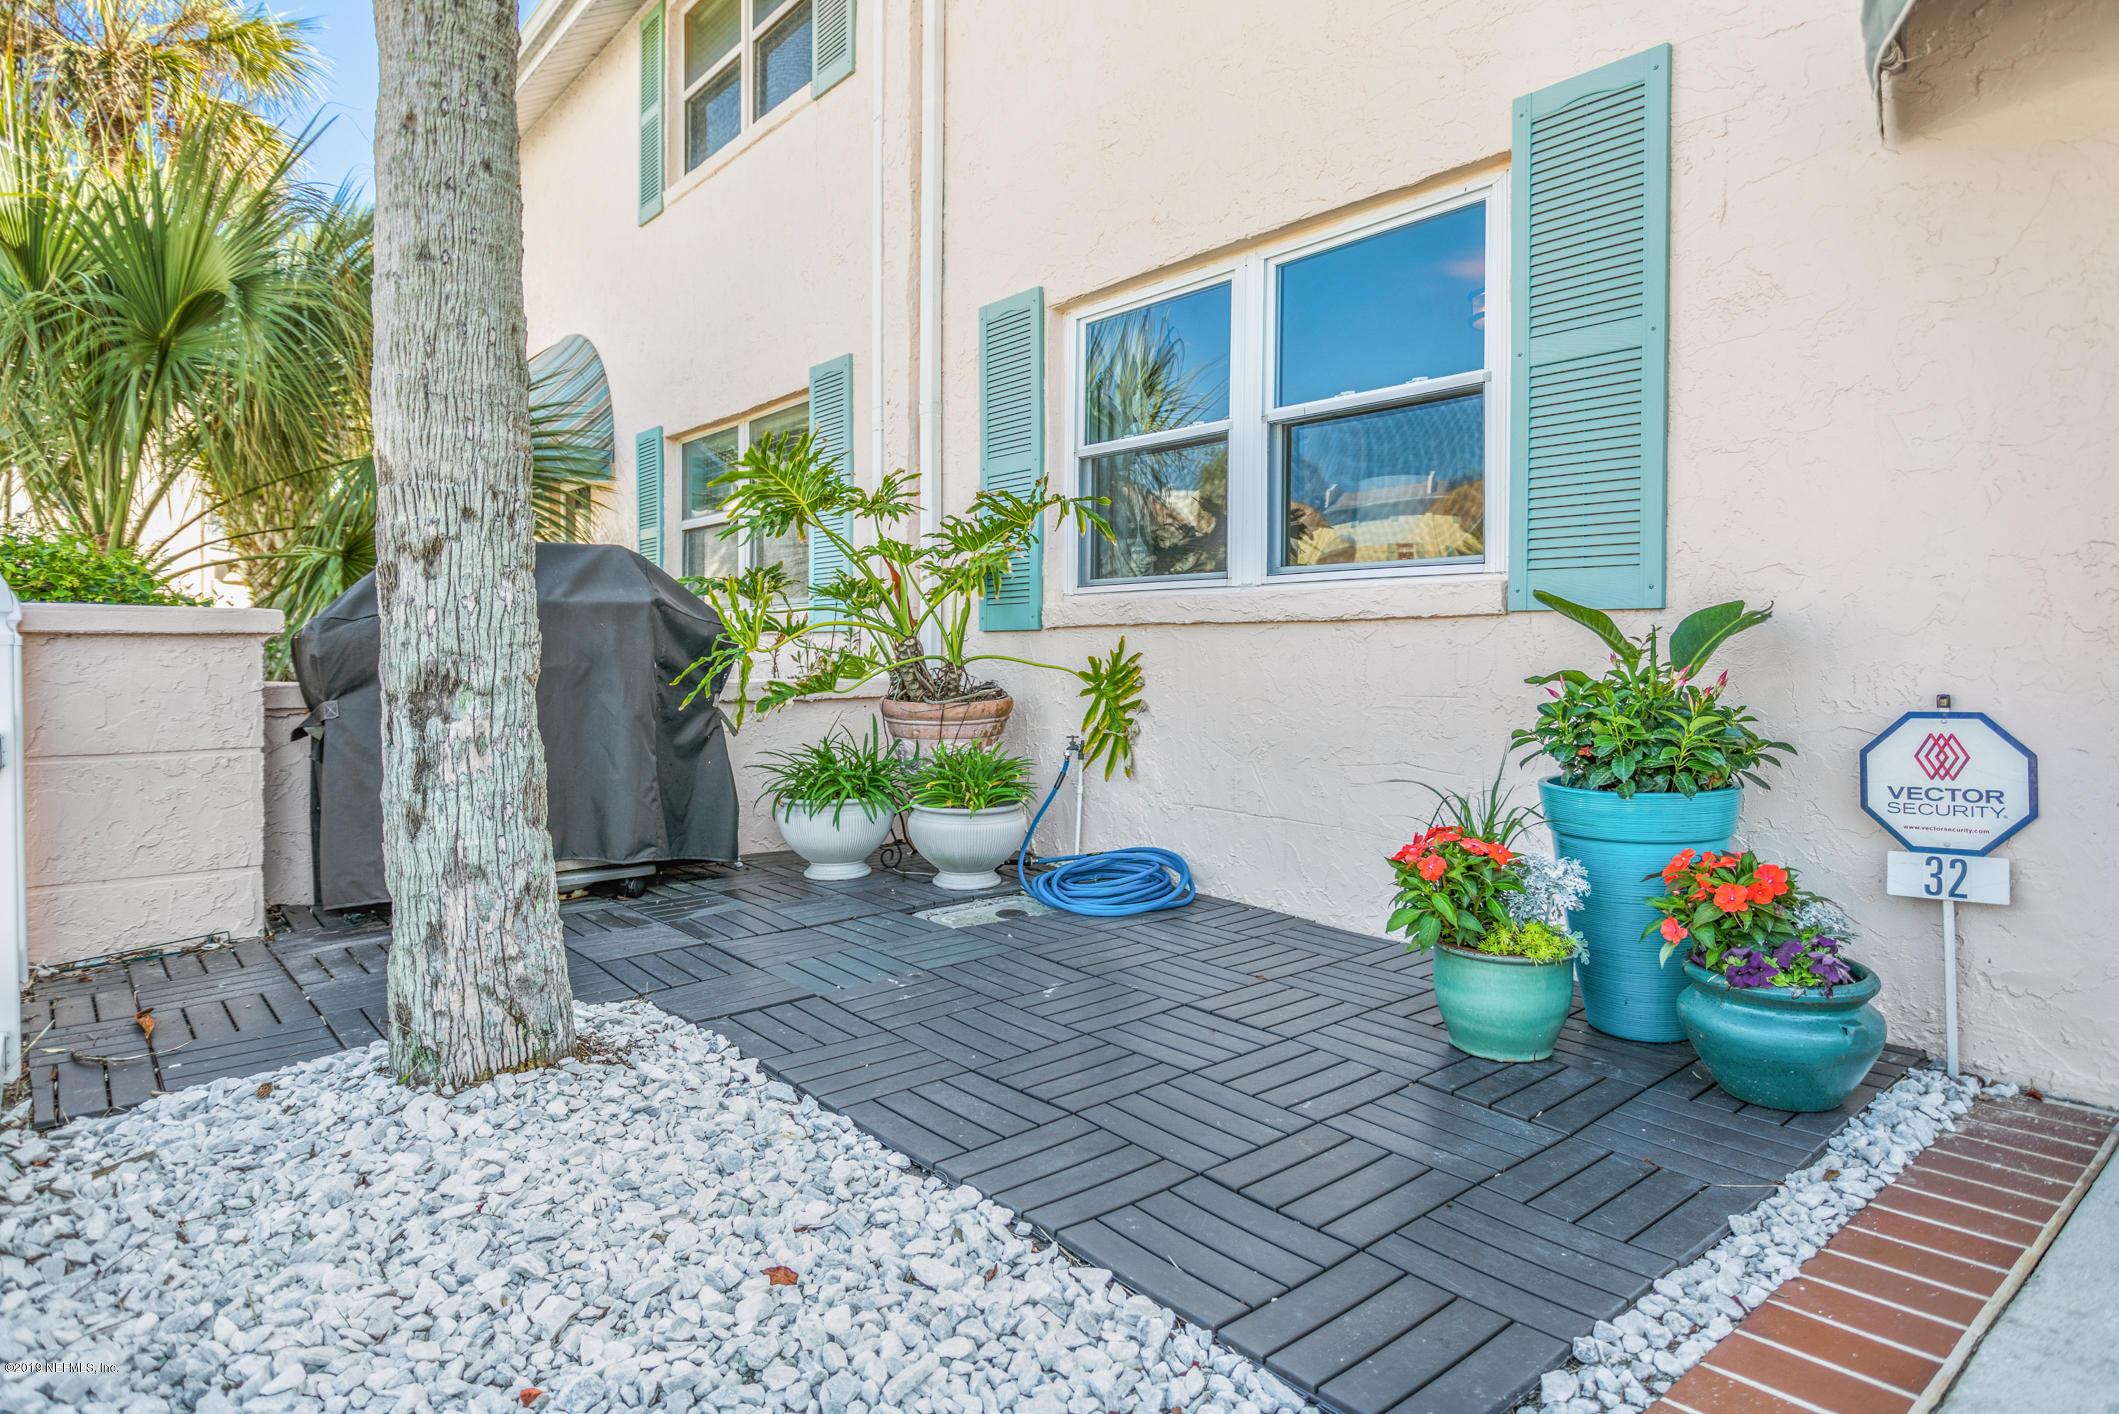 2233 SEMINOLE- ATLANTIC BEACH- FLORIDA 32233, 3 Bedrooms Bedrooms, ,2 BathroomsBathrooms,Condo,For sale,SEMINOLE,989443